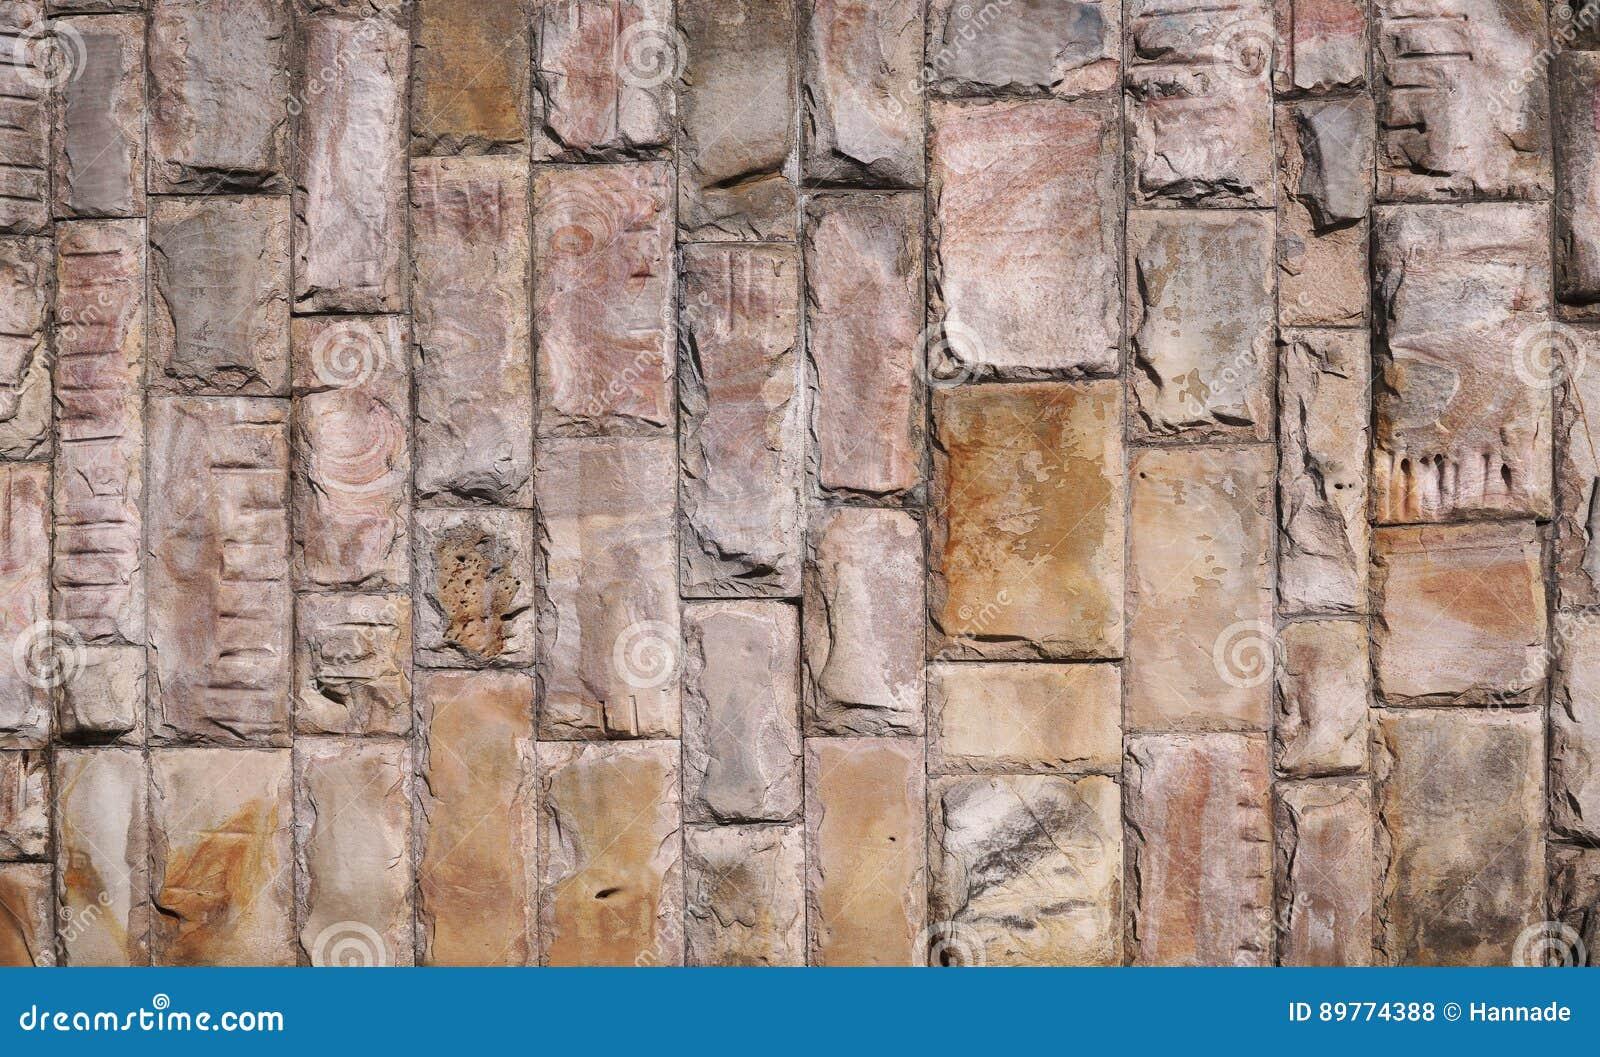 Wall of stone blocks